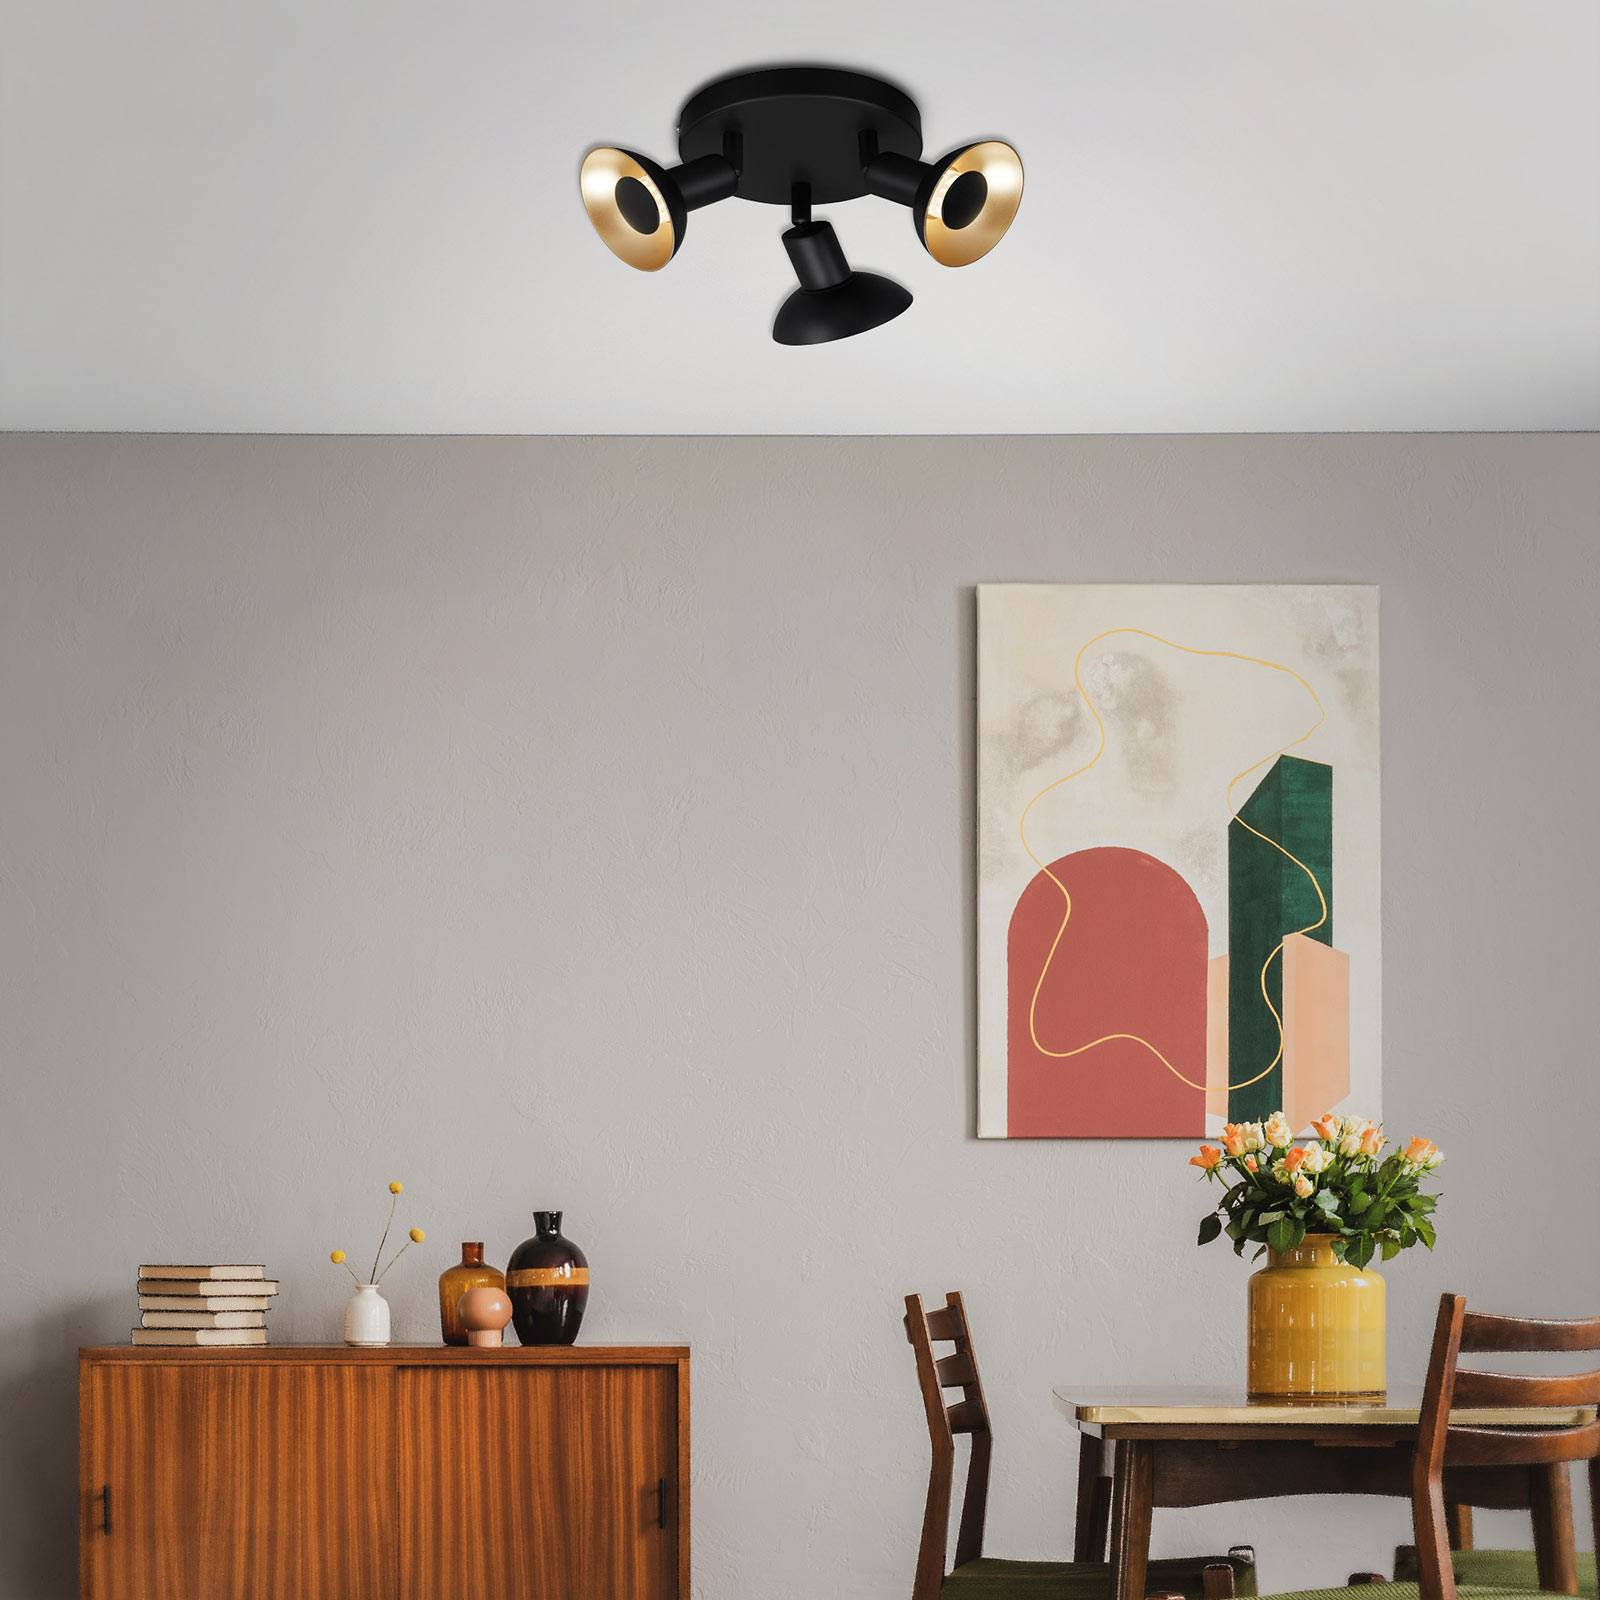 LED-taklampe Kukui, Rondell, 3 lyskilder